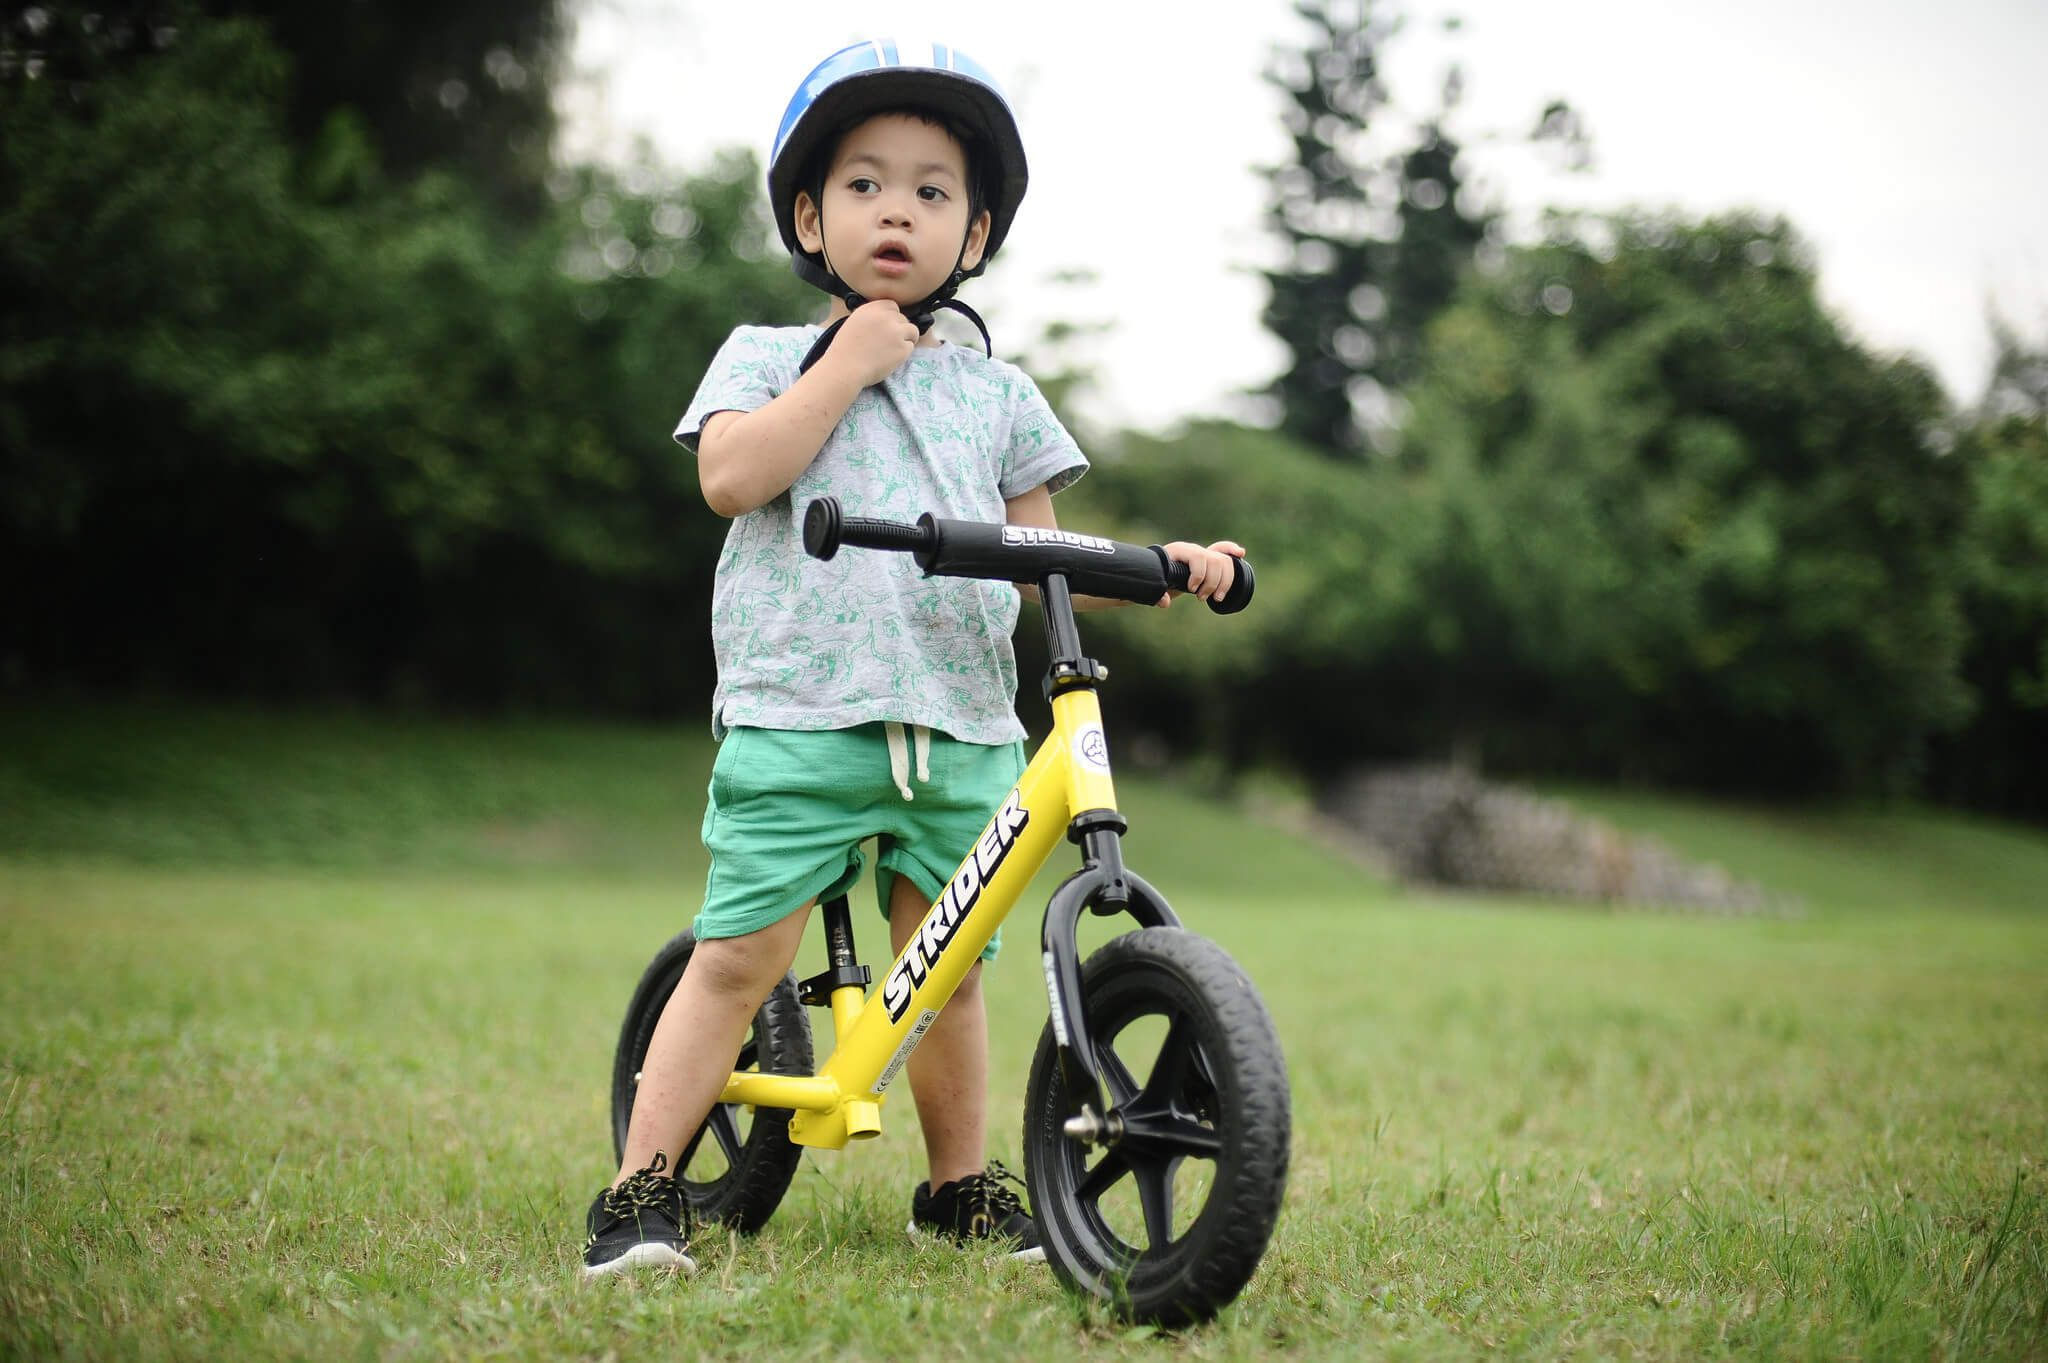 Strider Sport Balance Bike Review 2018 Balance bike